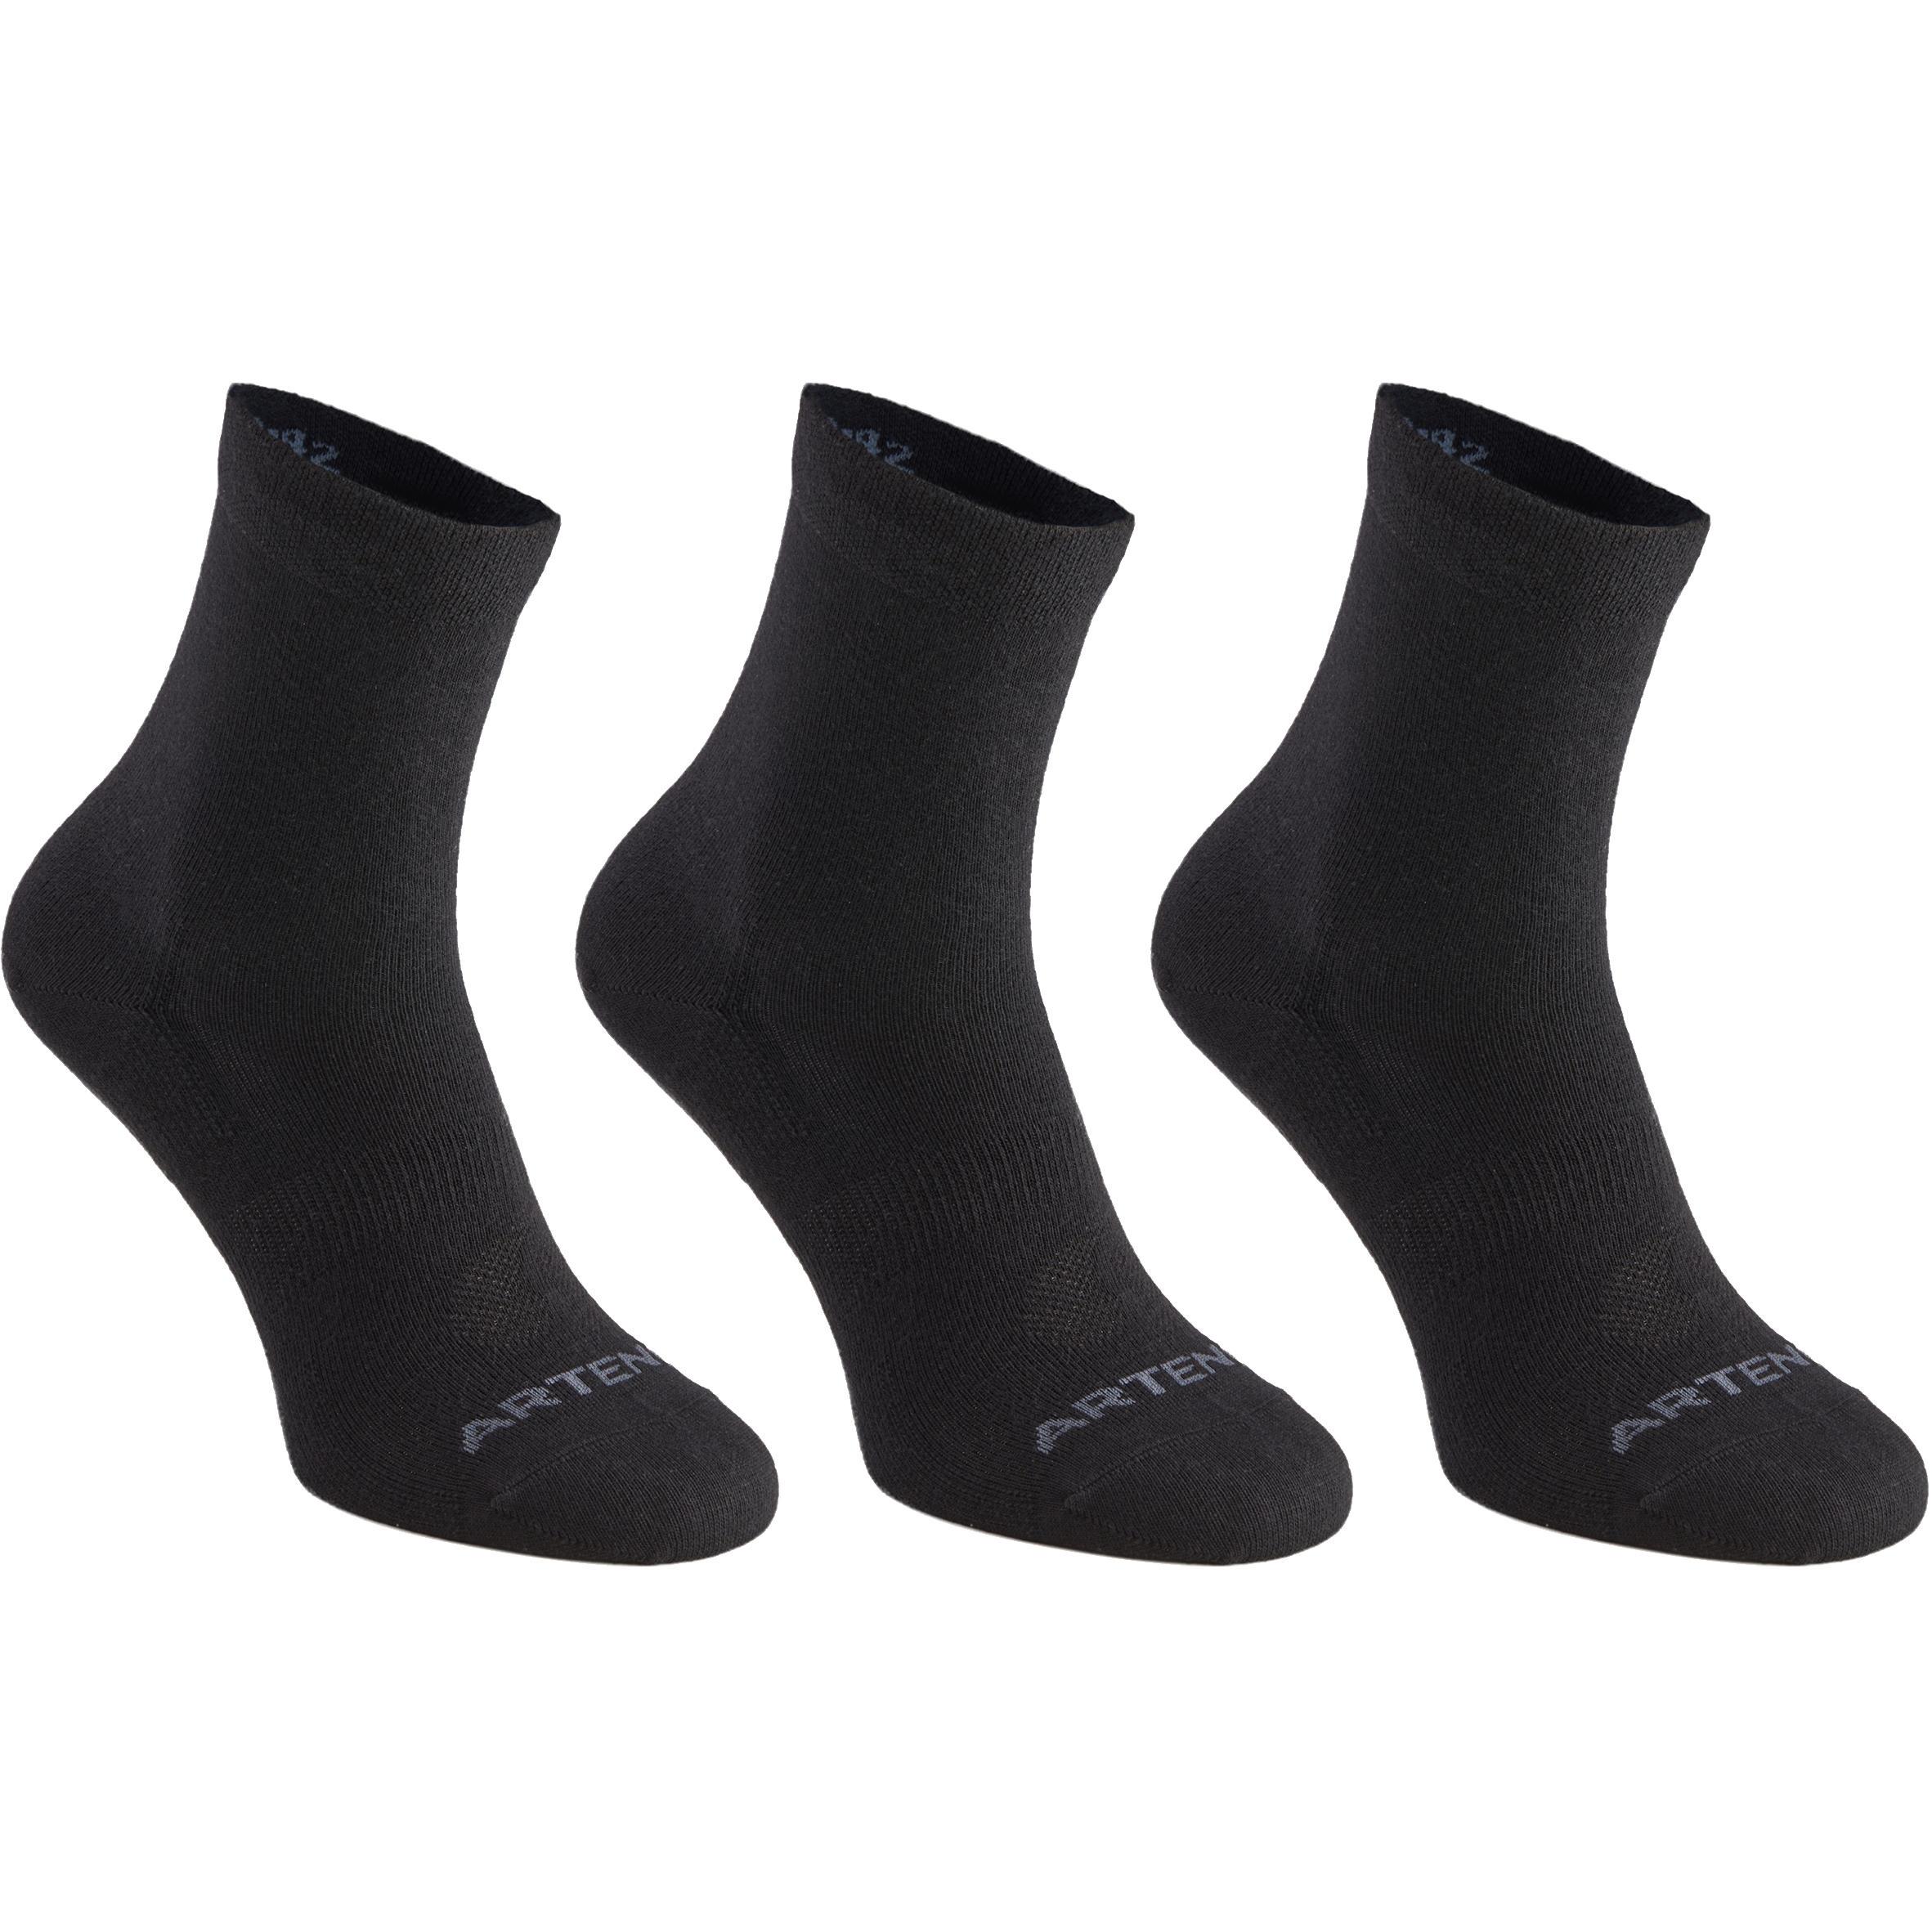 calcetines de deporte largos artengo